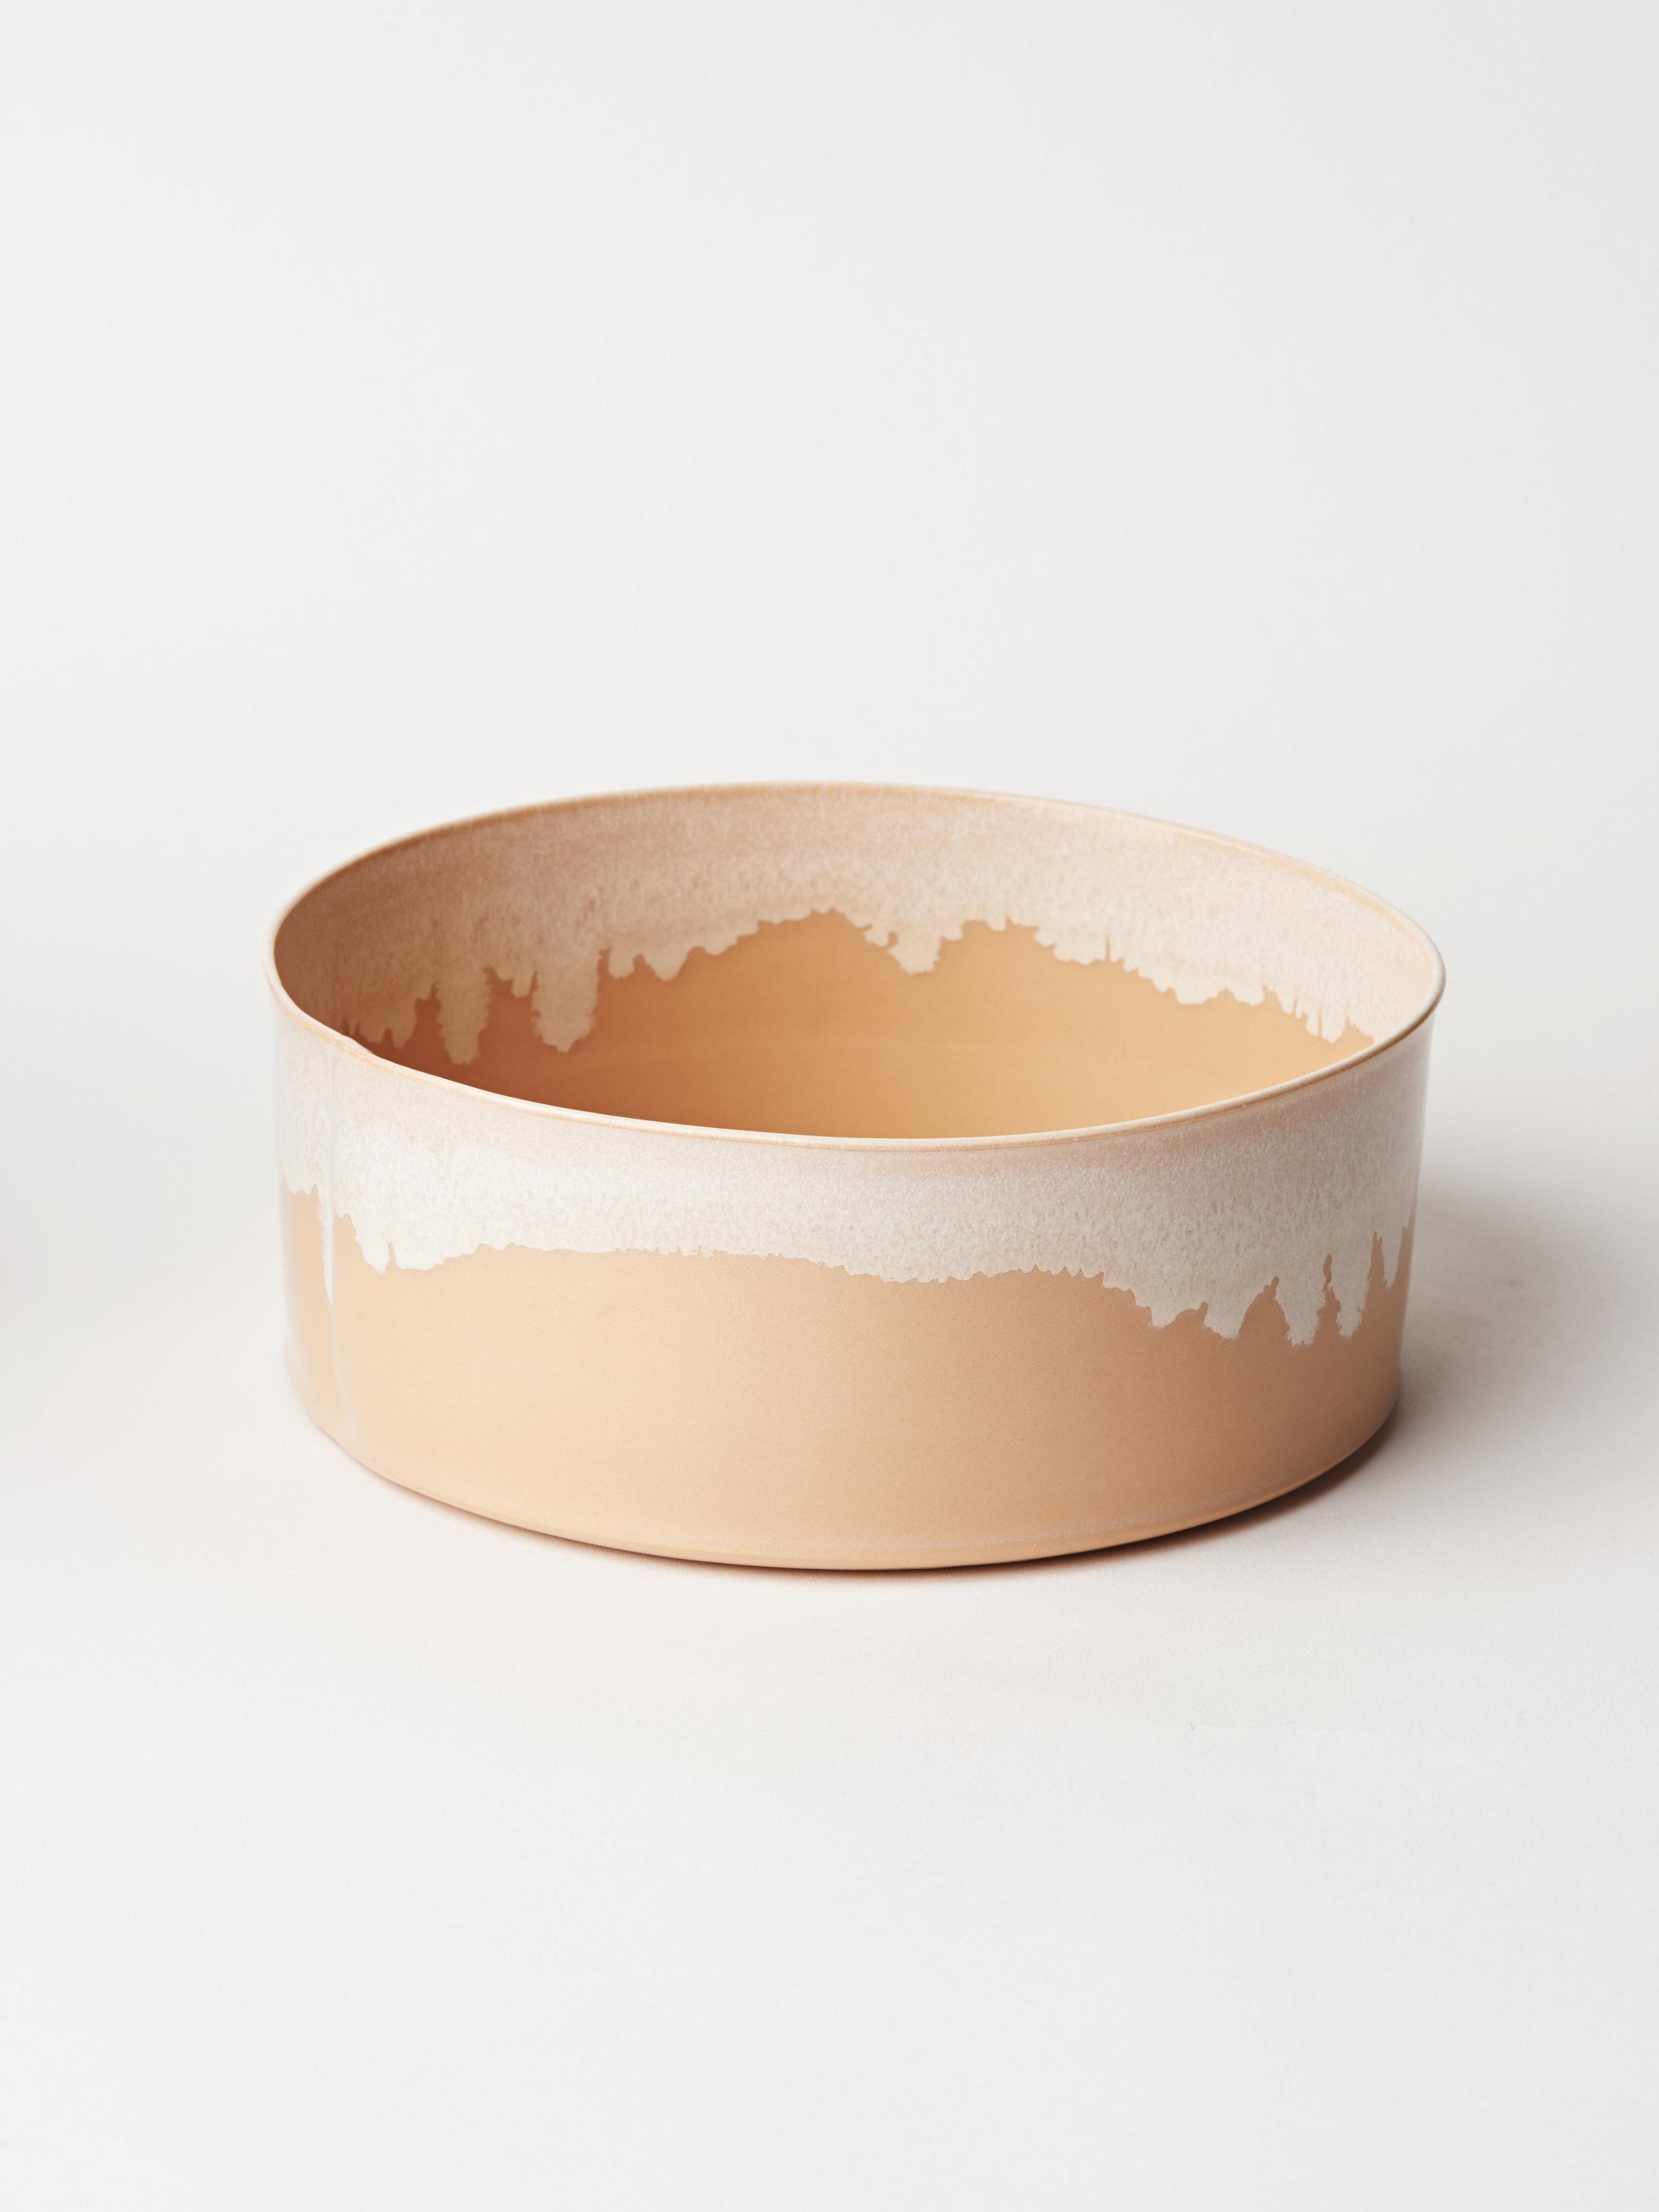 "Nesting Bowl ⌀ 8.5"" x 3.5"" - Peach"